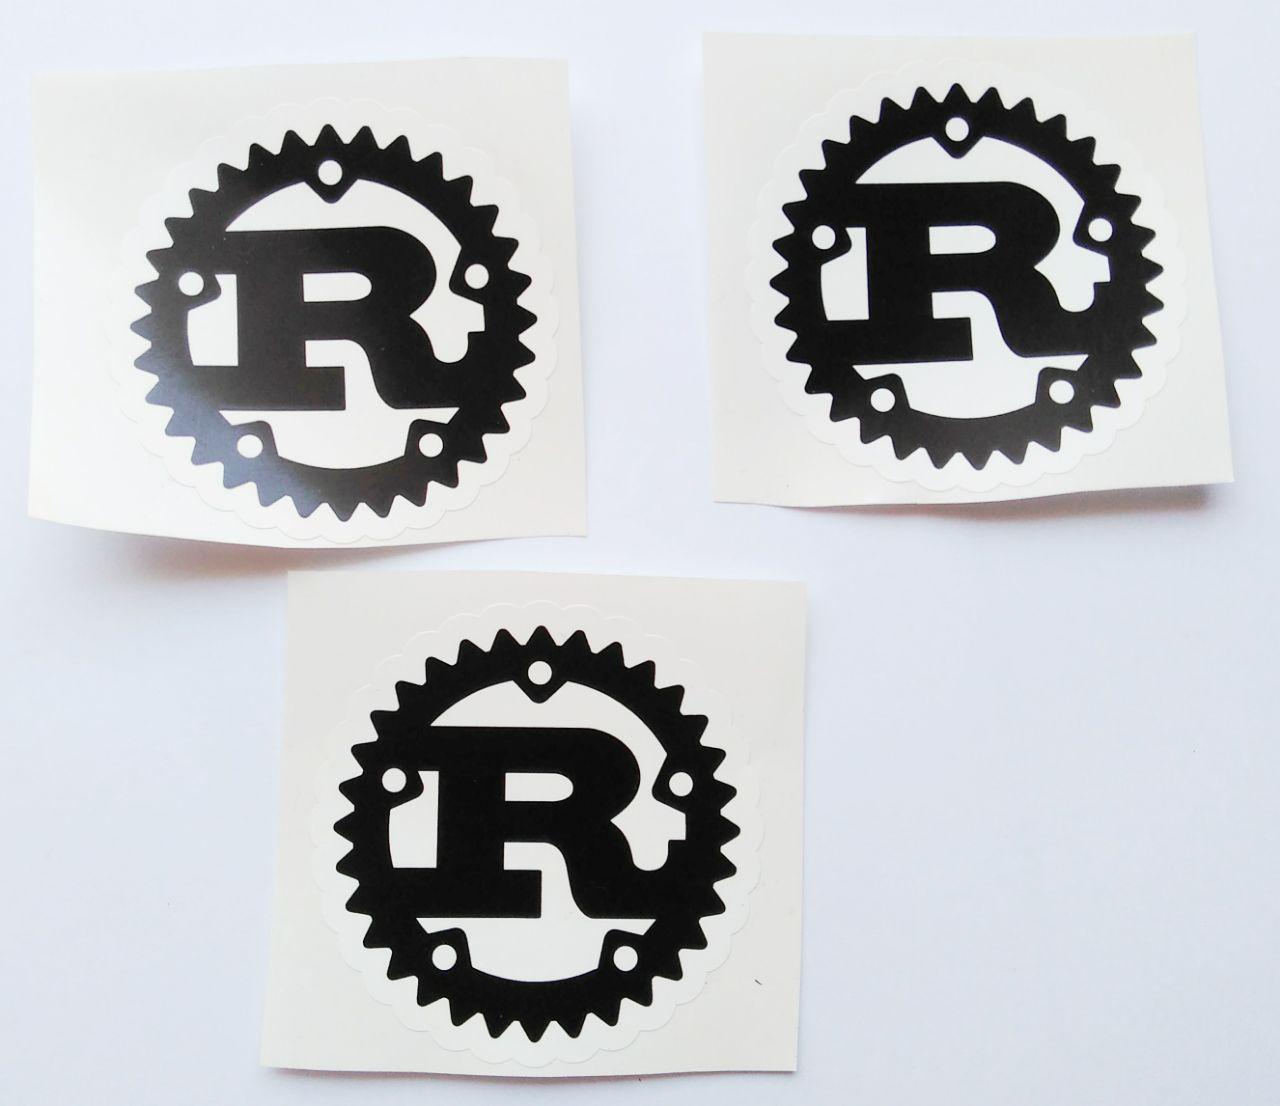 Stiker Rust - Vinyl Cut 1